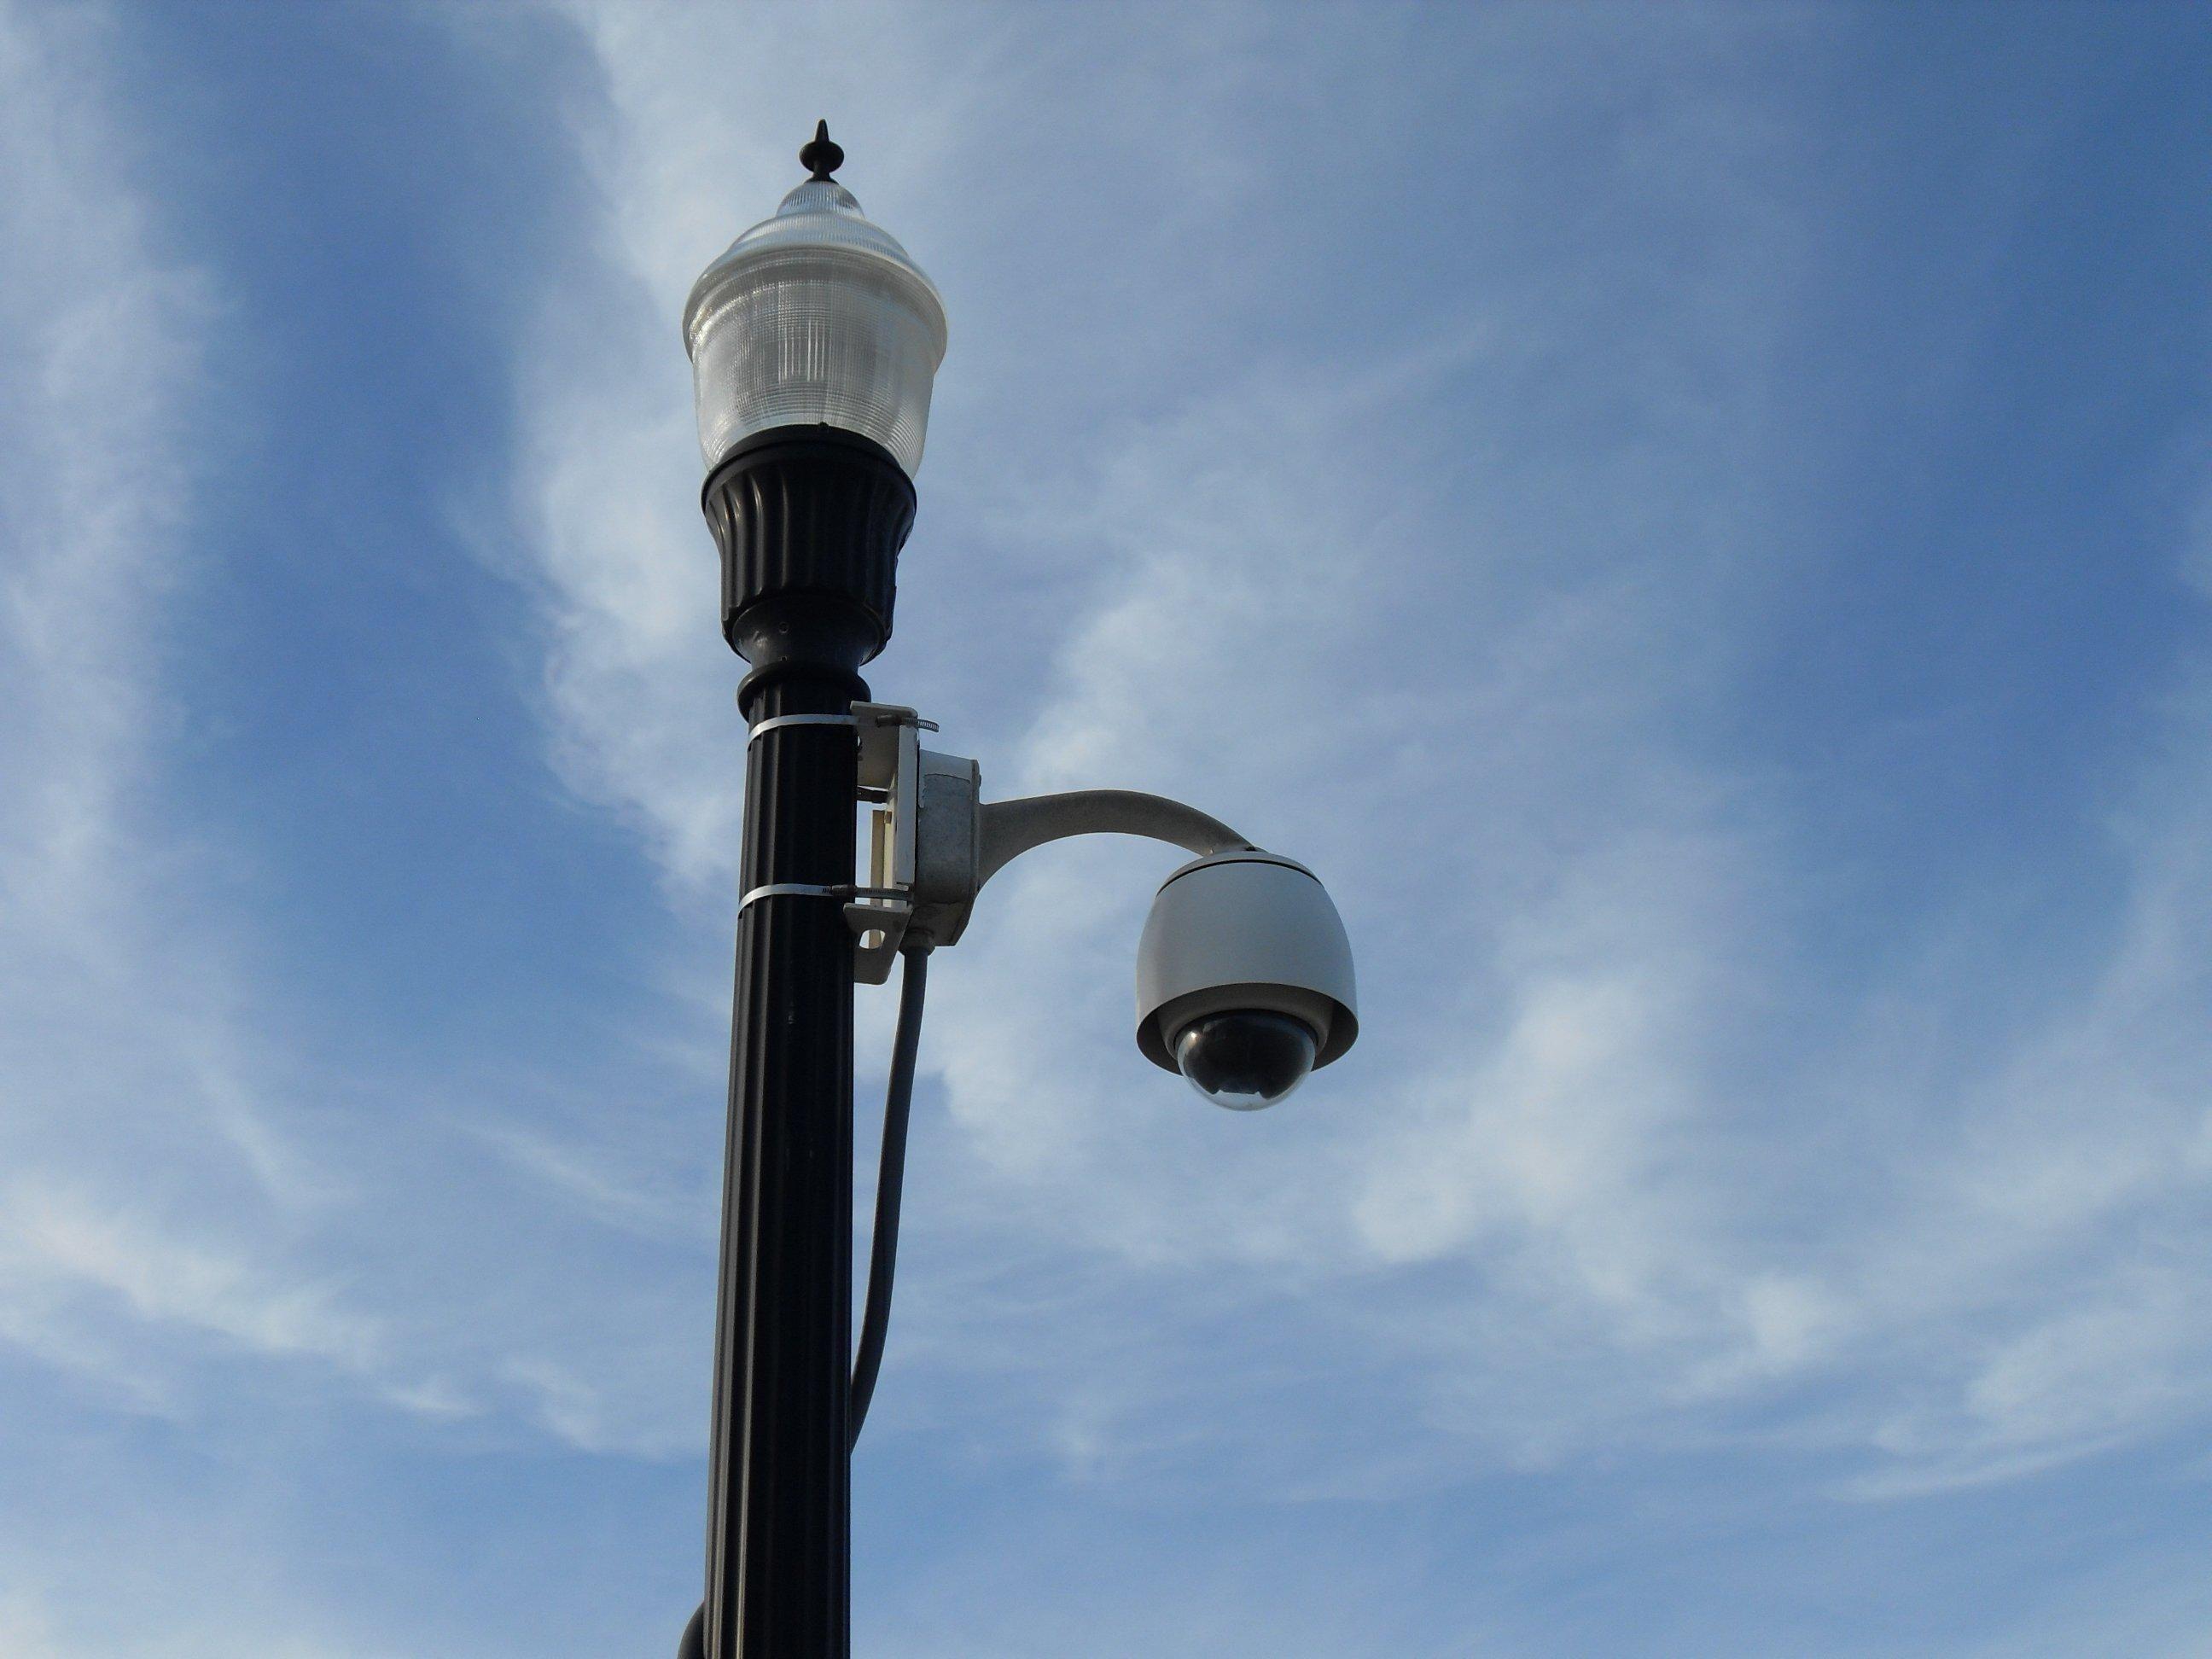 Eisen Lampe kostenlose bild: antike, straße, lampe, eisen, lampe